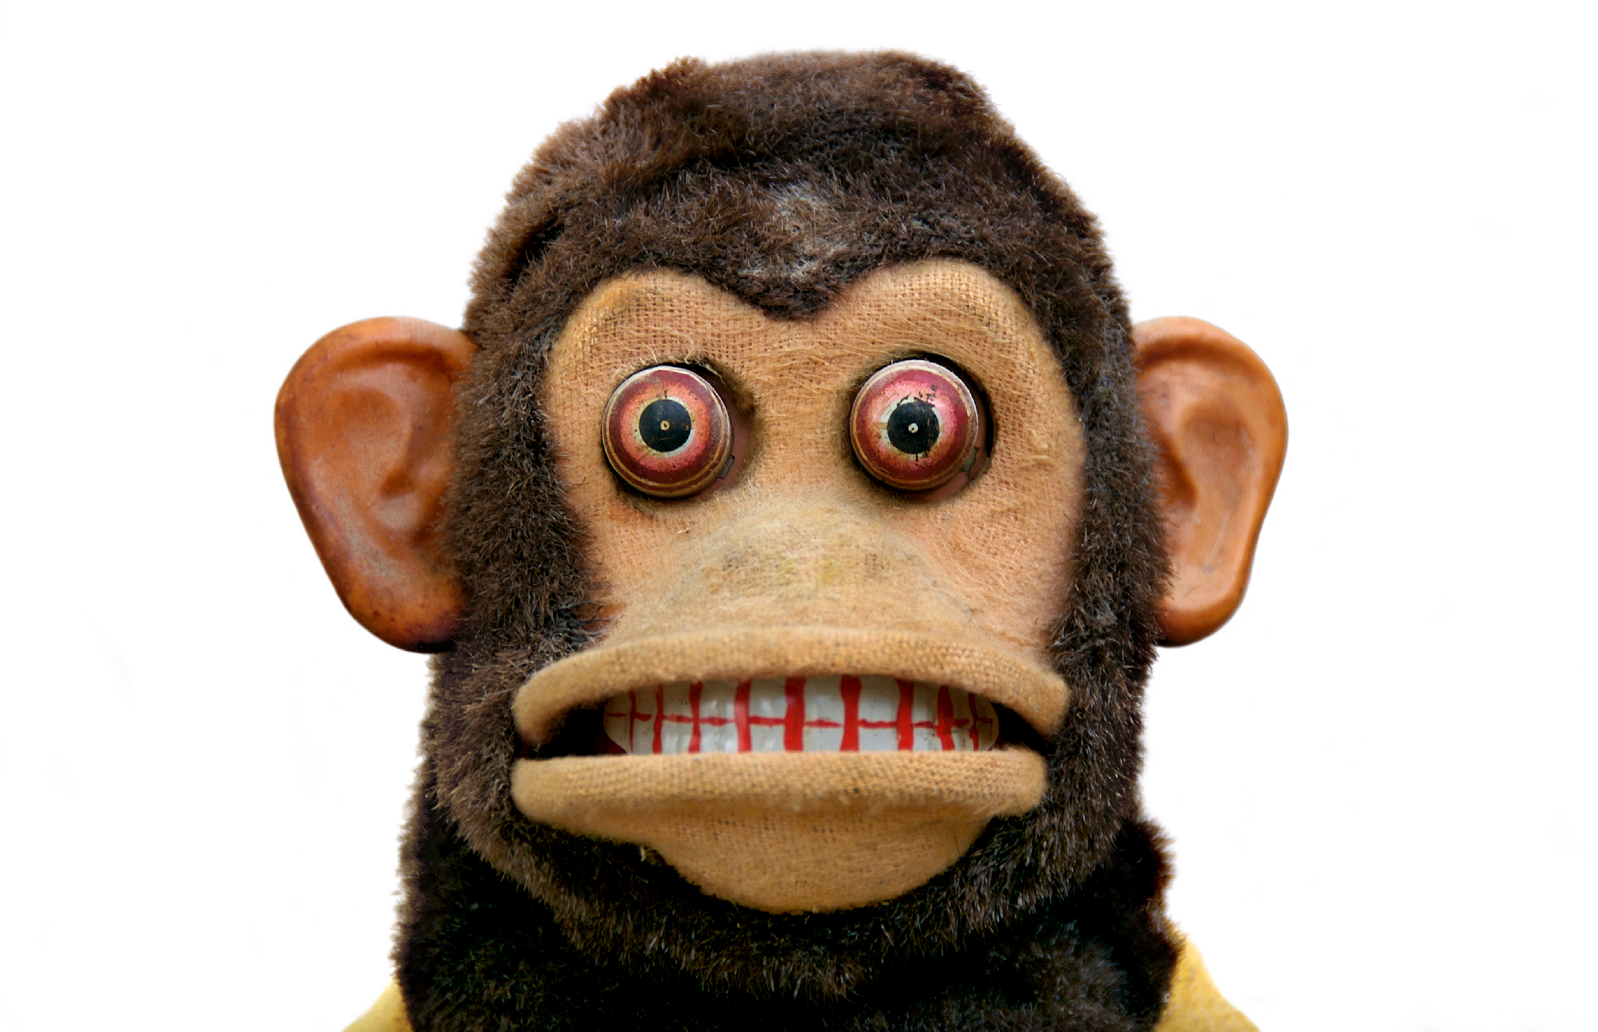 magic monkey face